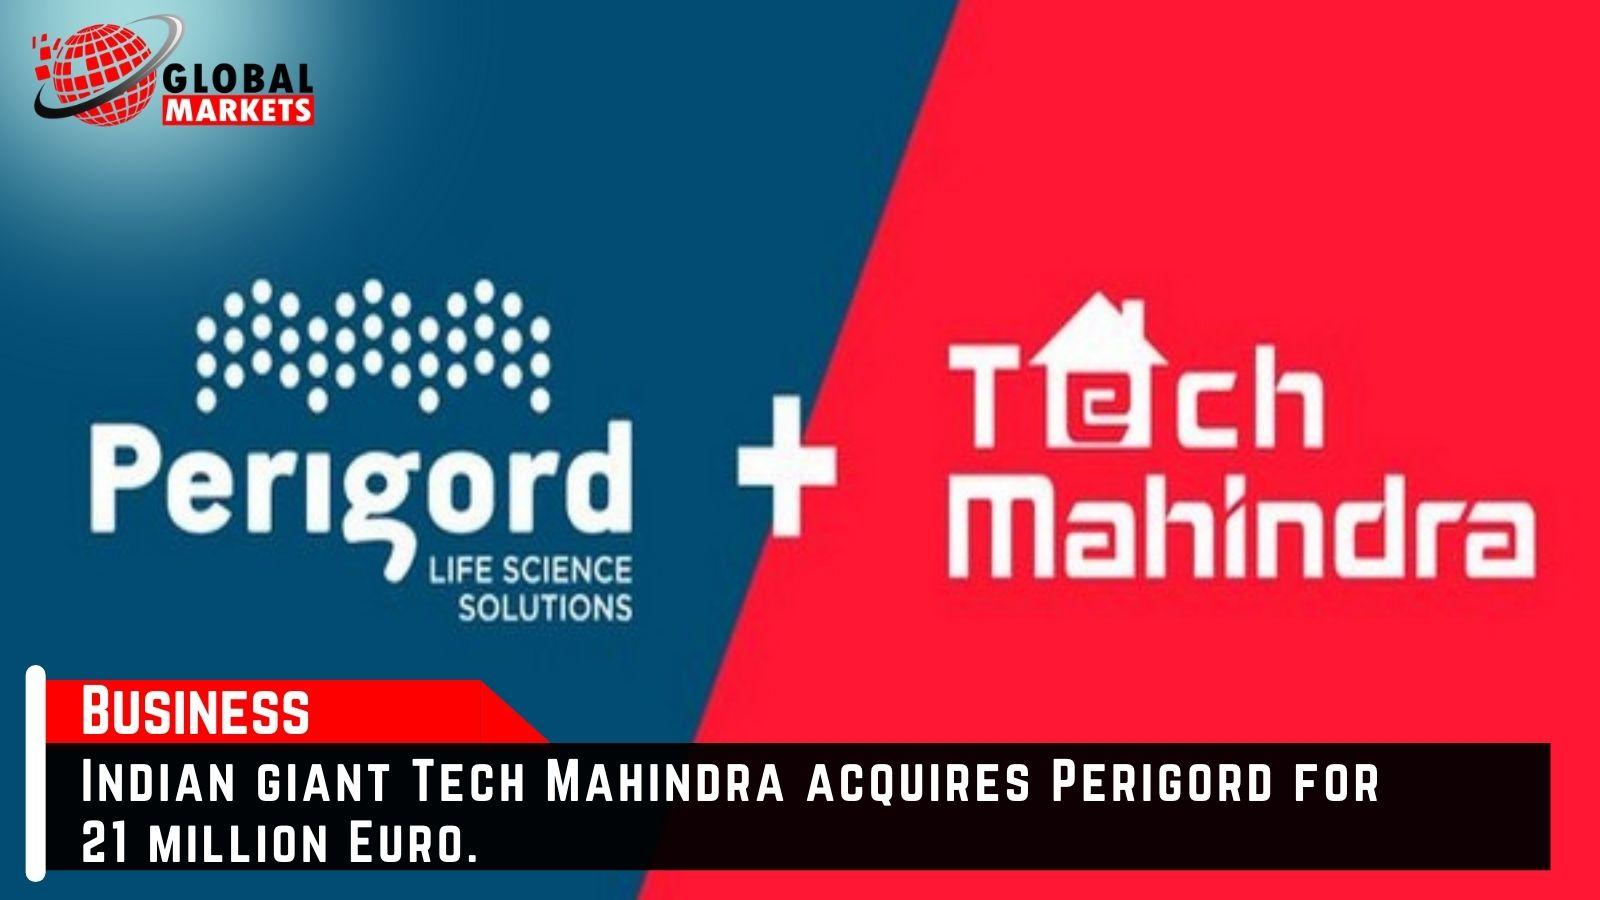 Indian giant Tech Mahindra acquires Perigord for 21 million Euro.